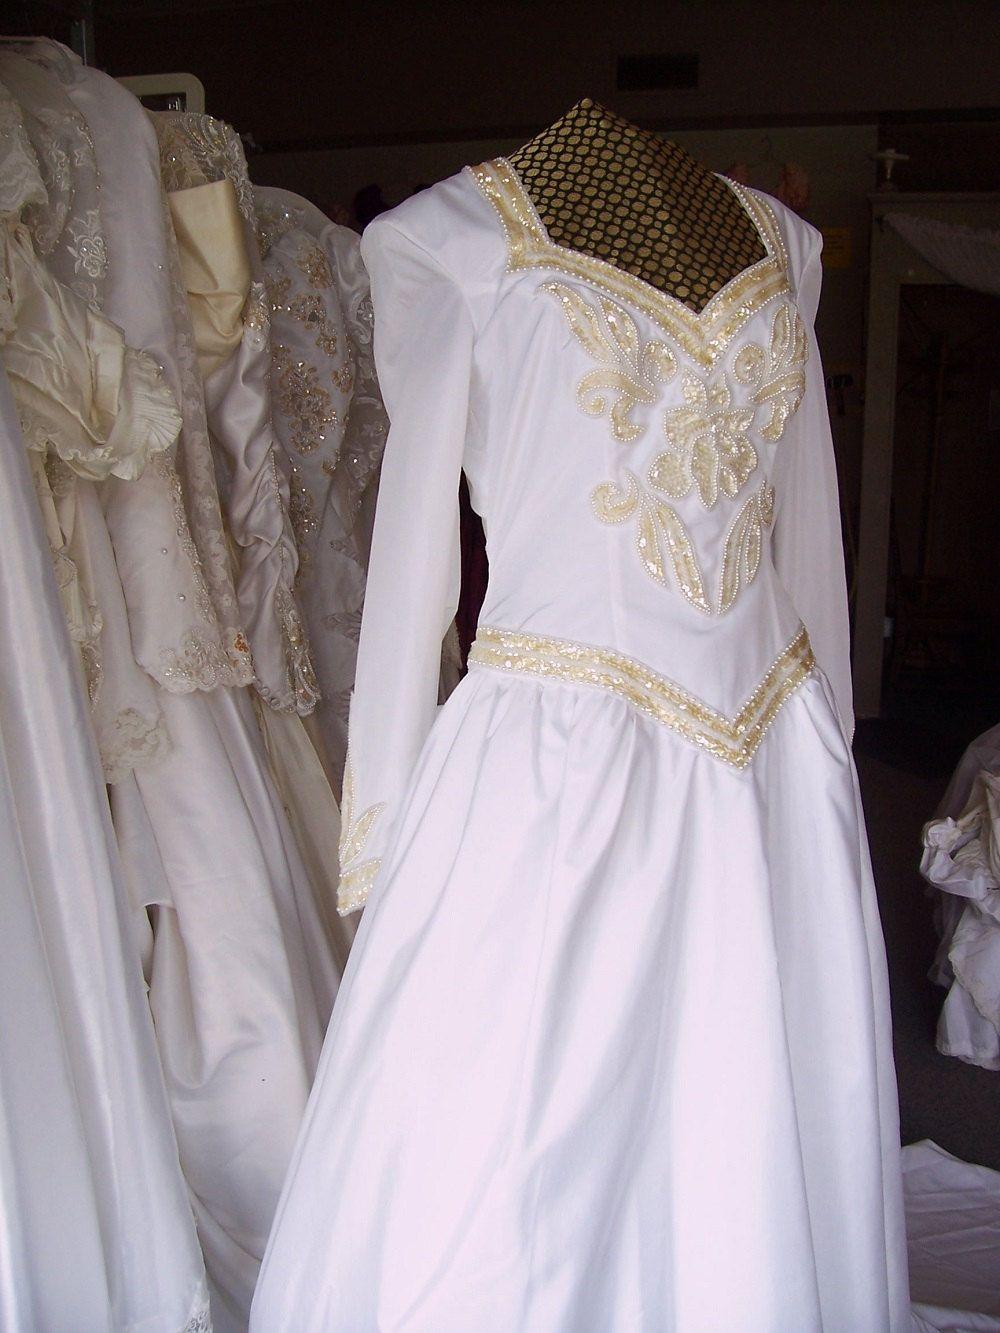 Vintage Medieval style Wedding Dress with Crinoline Slip by ...